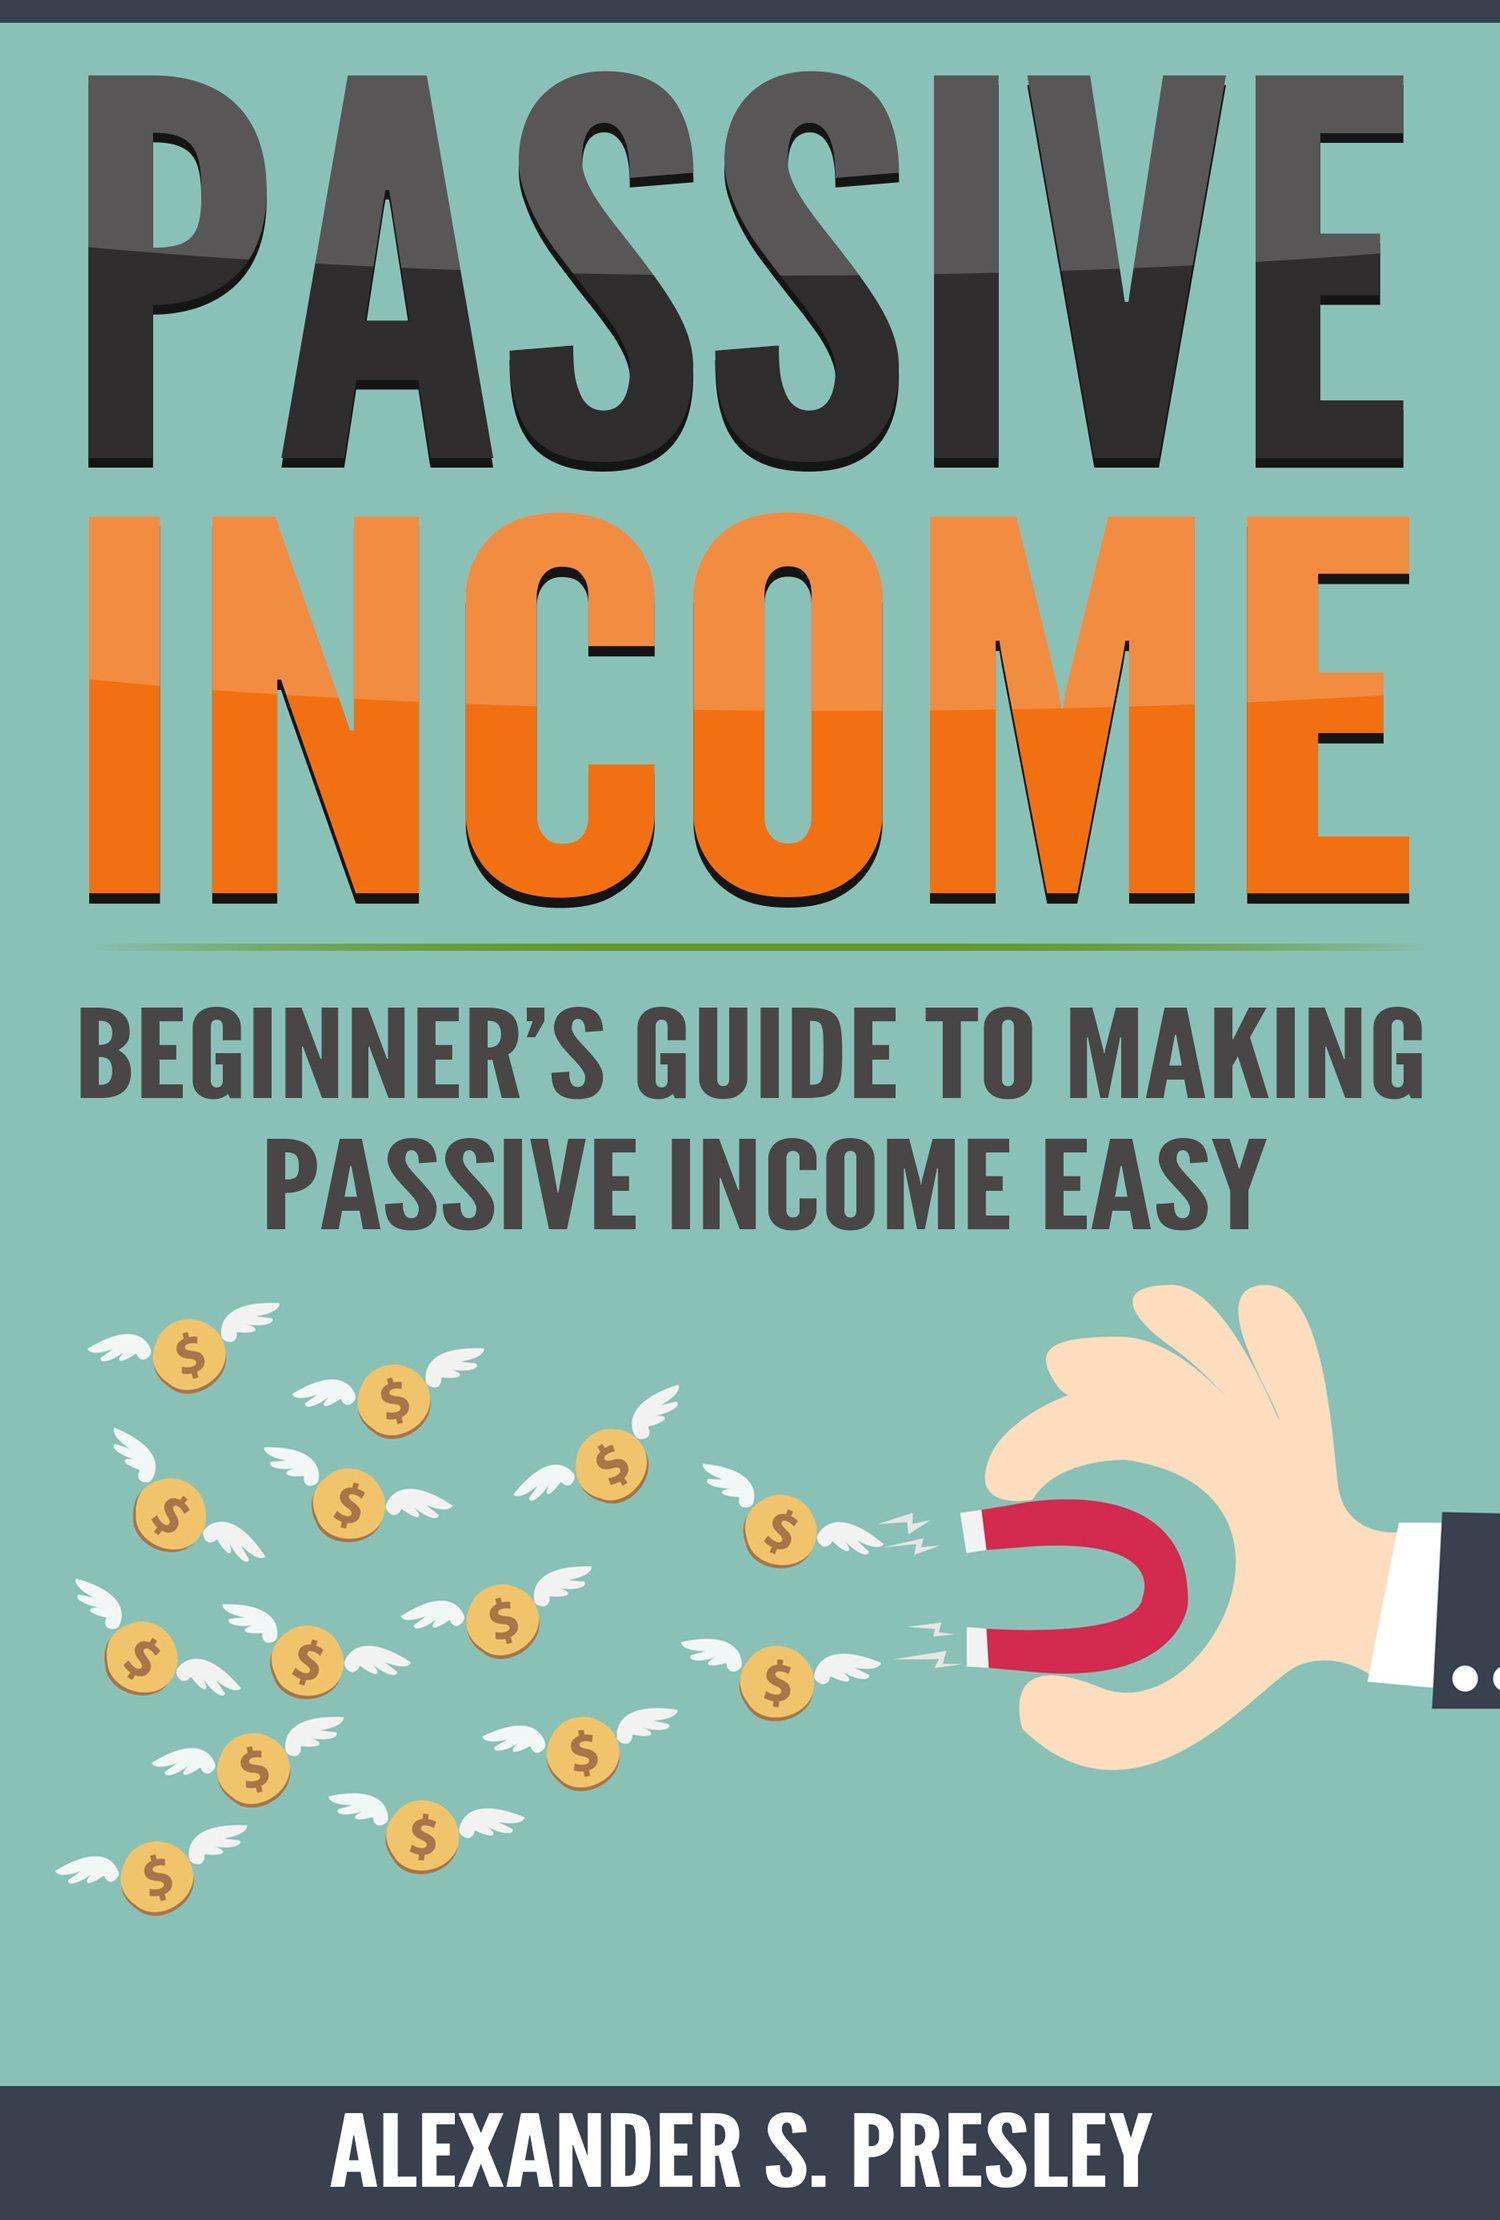 Passive Income: Beginner's Guide to Making Passive Income Easy (Affiliate Marketing, E-books, Memberships, Youtube, Blogging)